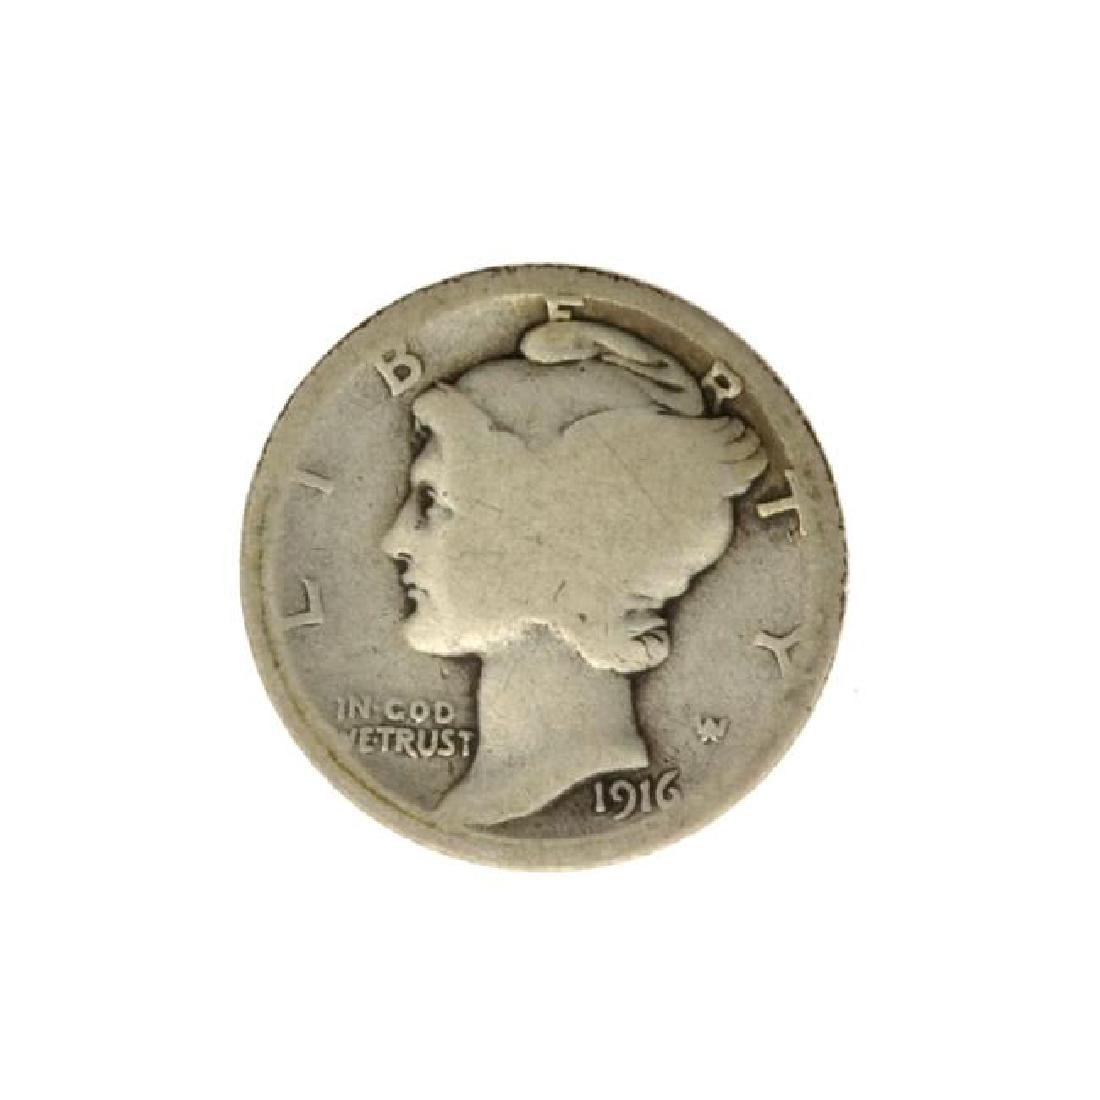 1916-D Mercury Dime Coin - Very Rare - (JG PS)